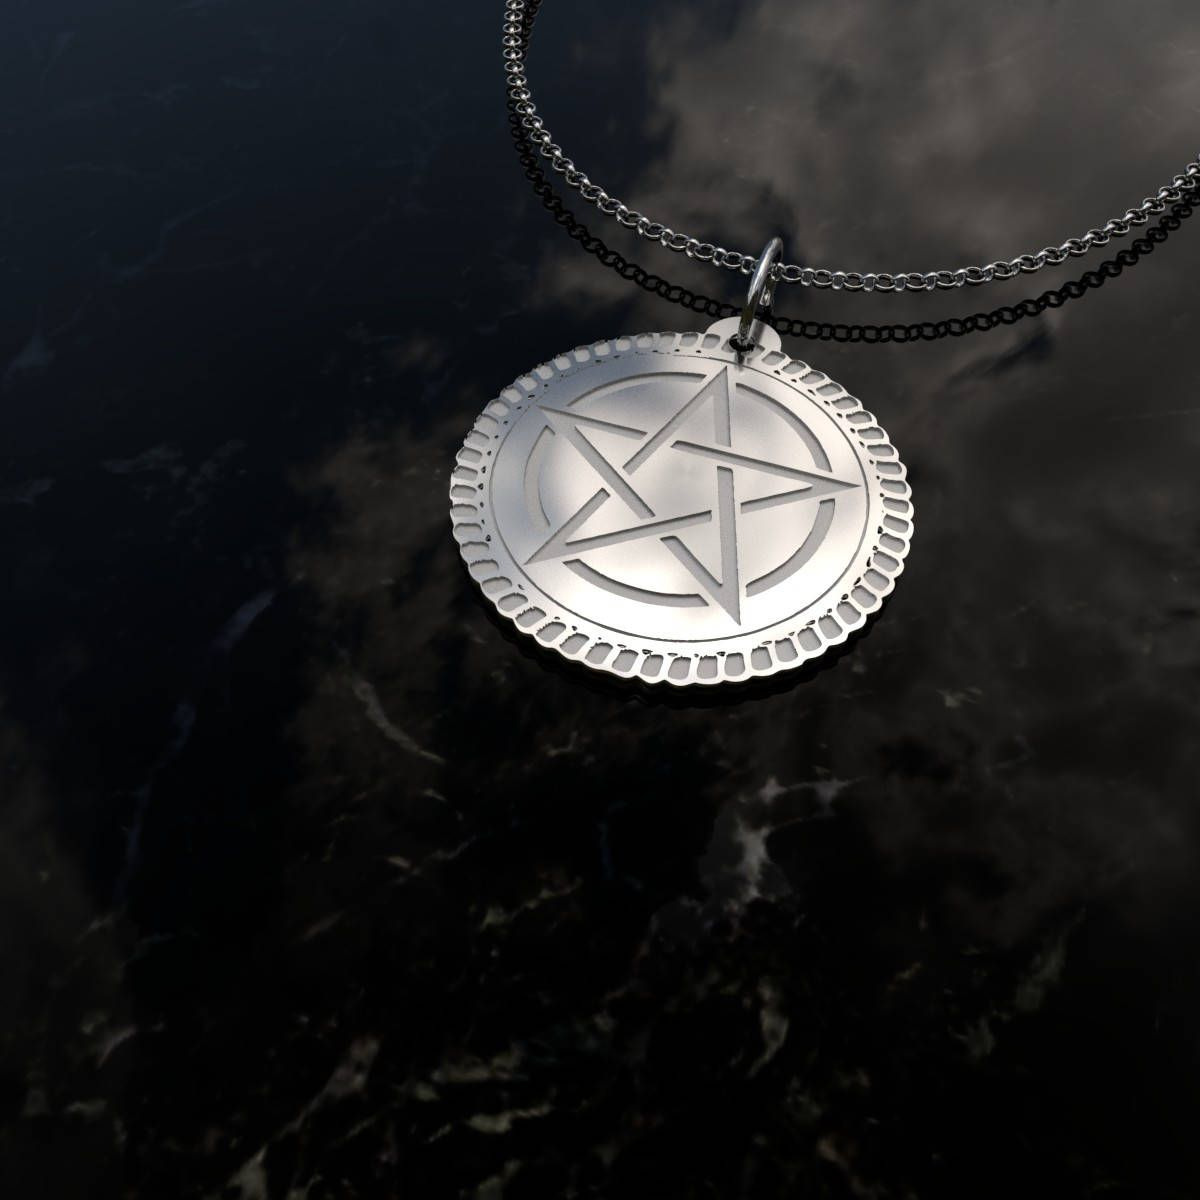 Wiccan pentagram pendant small pentagram pendant sterling silver wiccan pentagram pendant small pentagram pendant sterling silver pentagram pendant aloadofball Choice Image